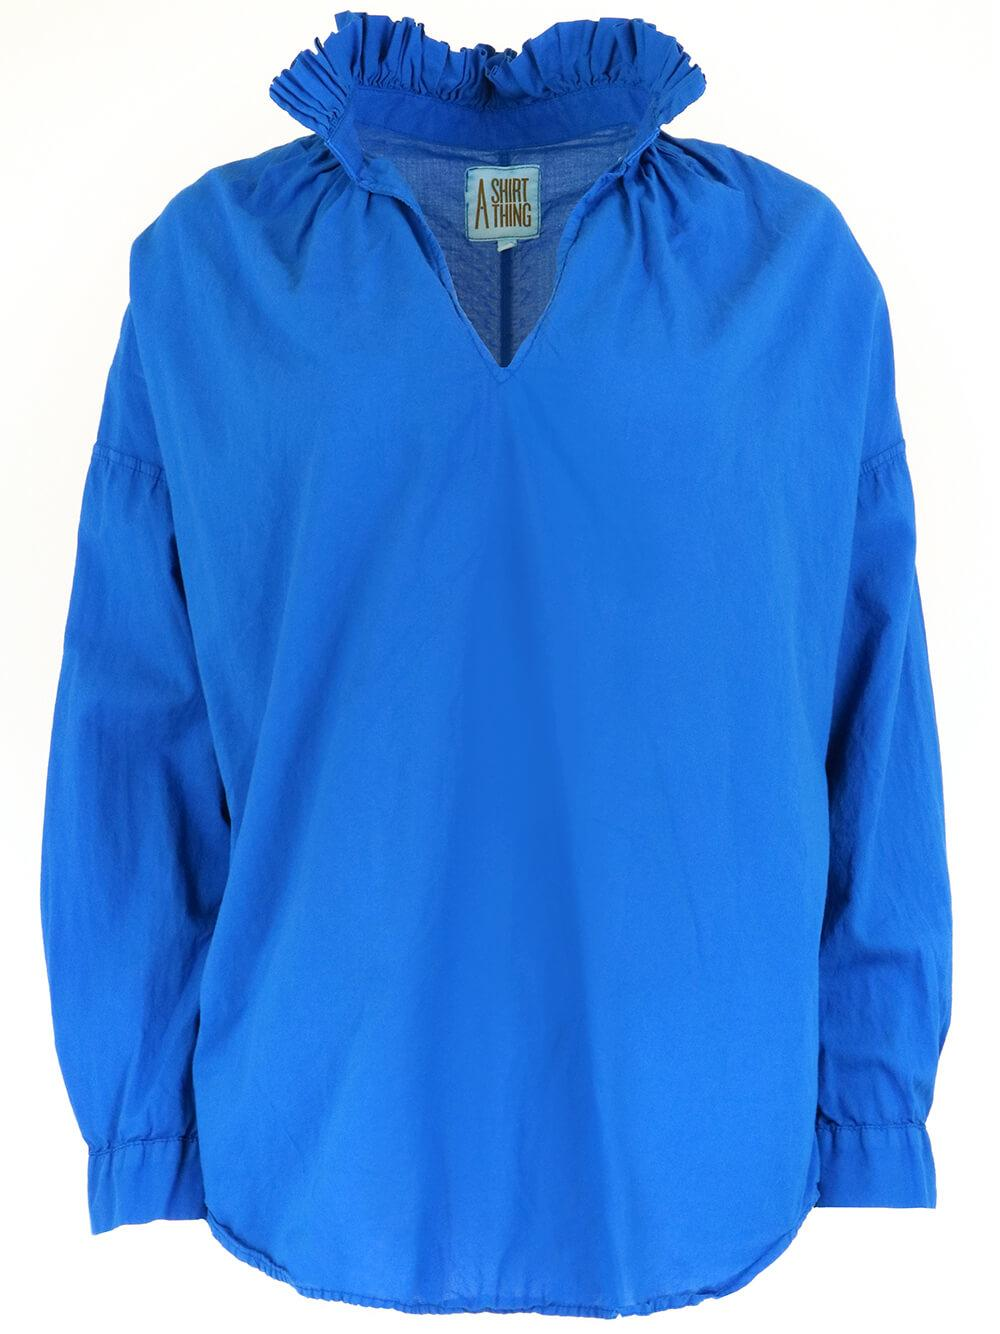 Penelope Cabo Shirt Item # 706-TP10188-R21